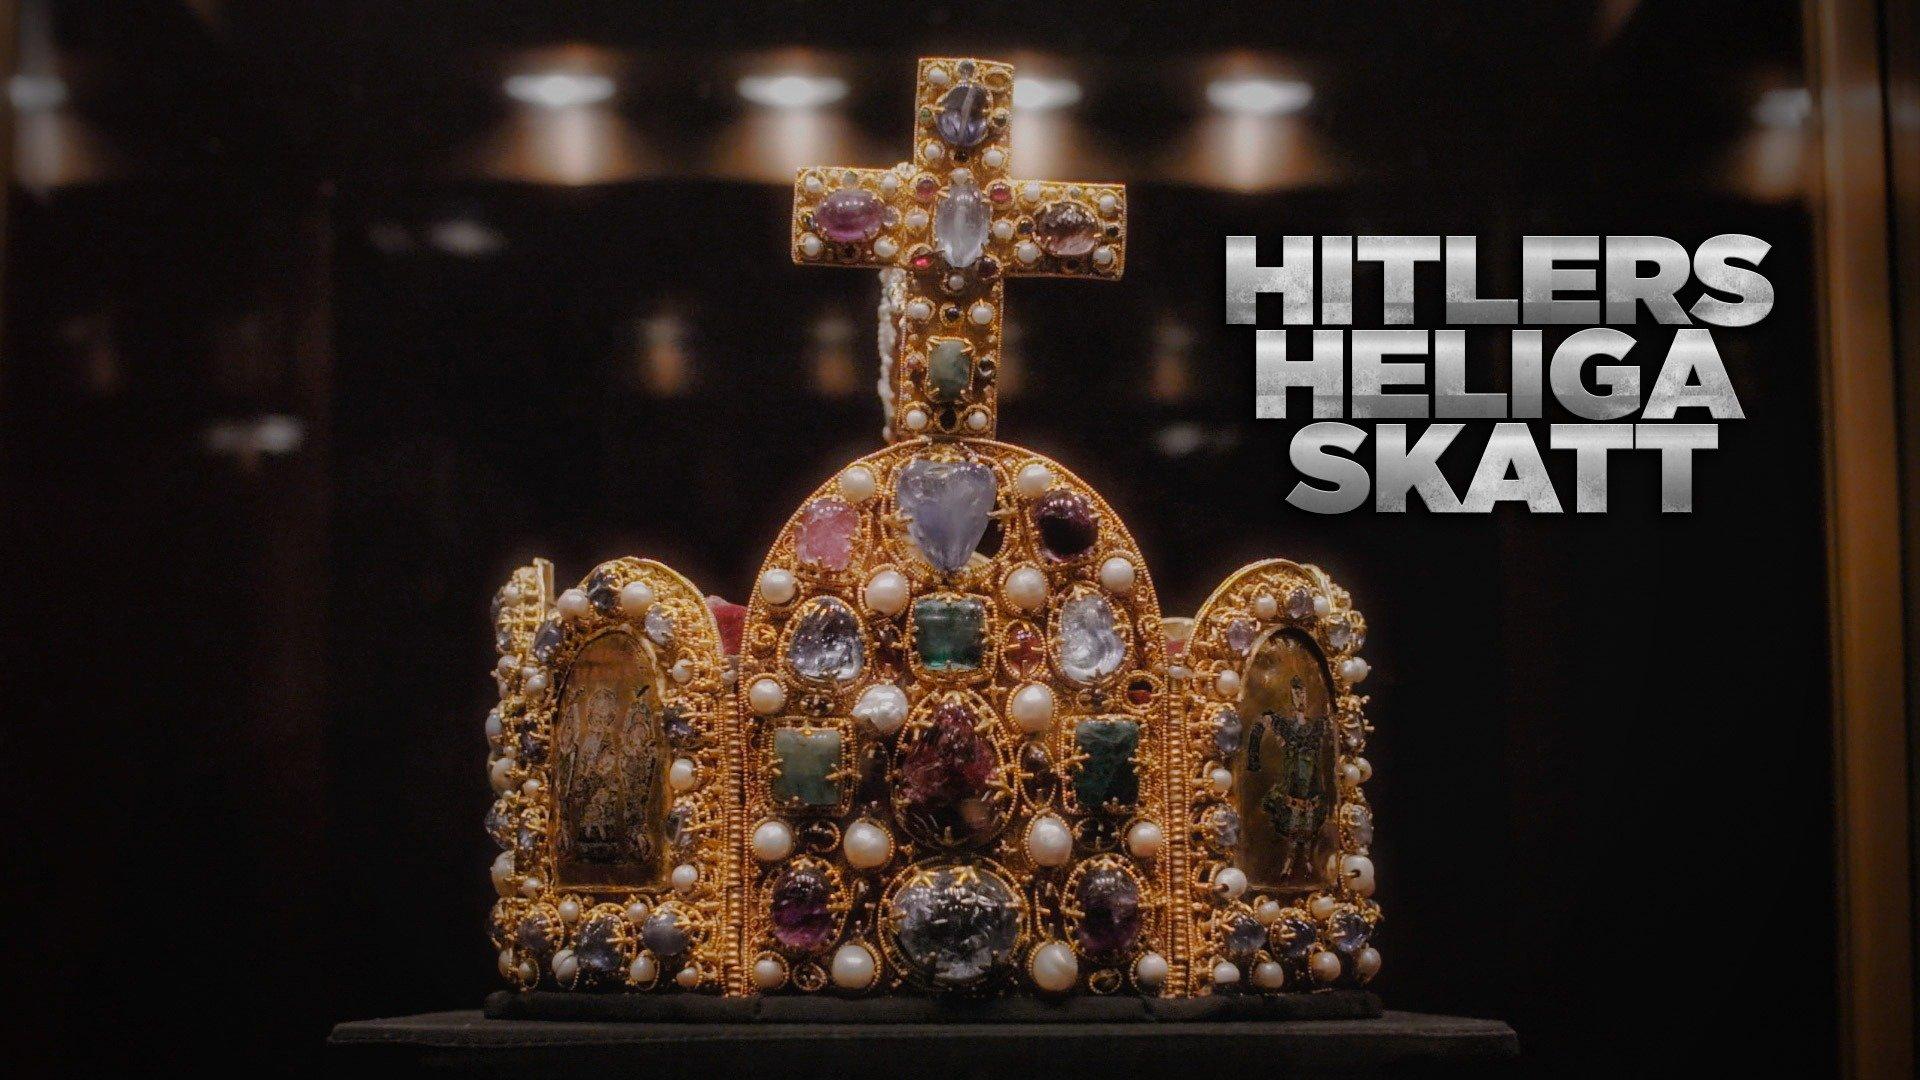 Hitlers heliga skatt